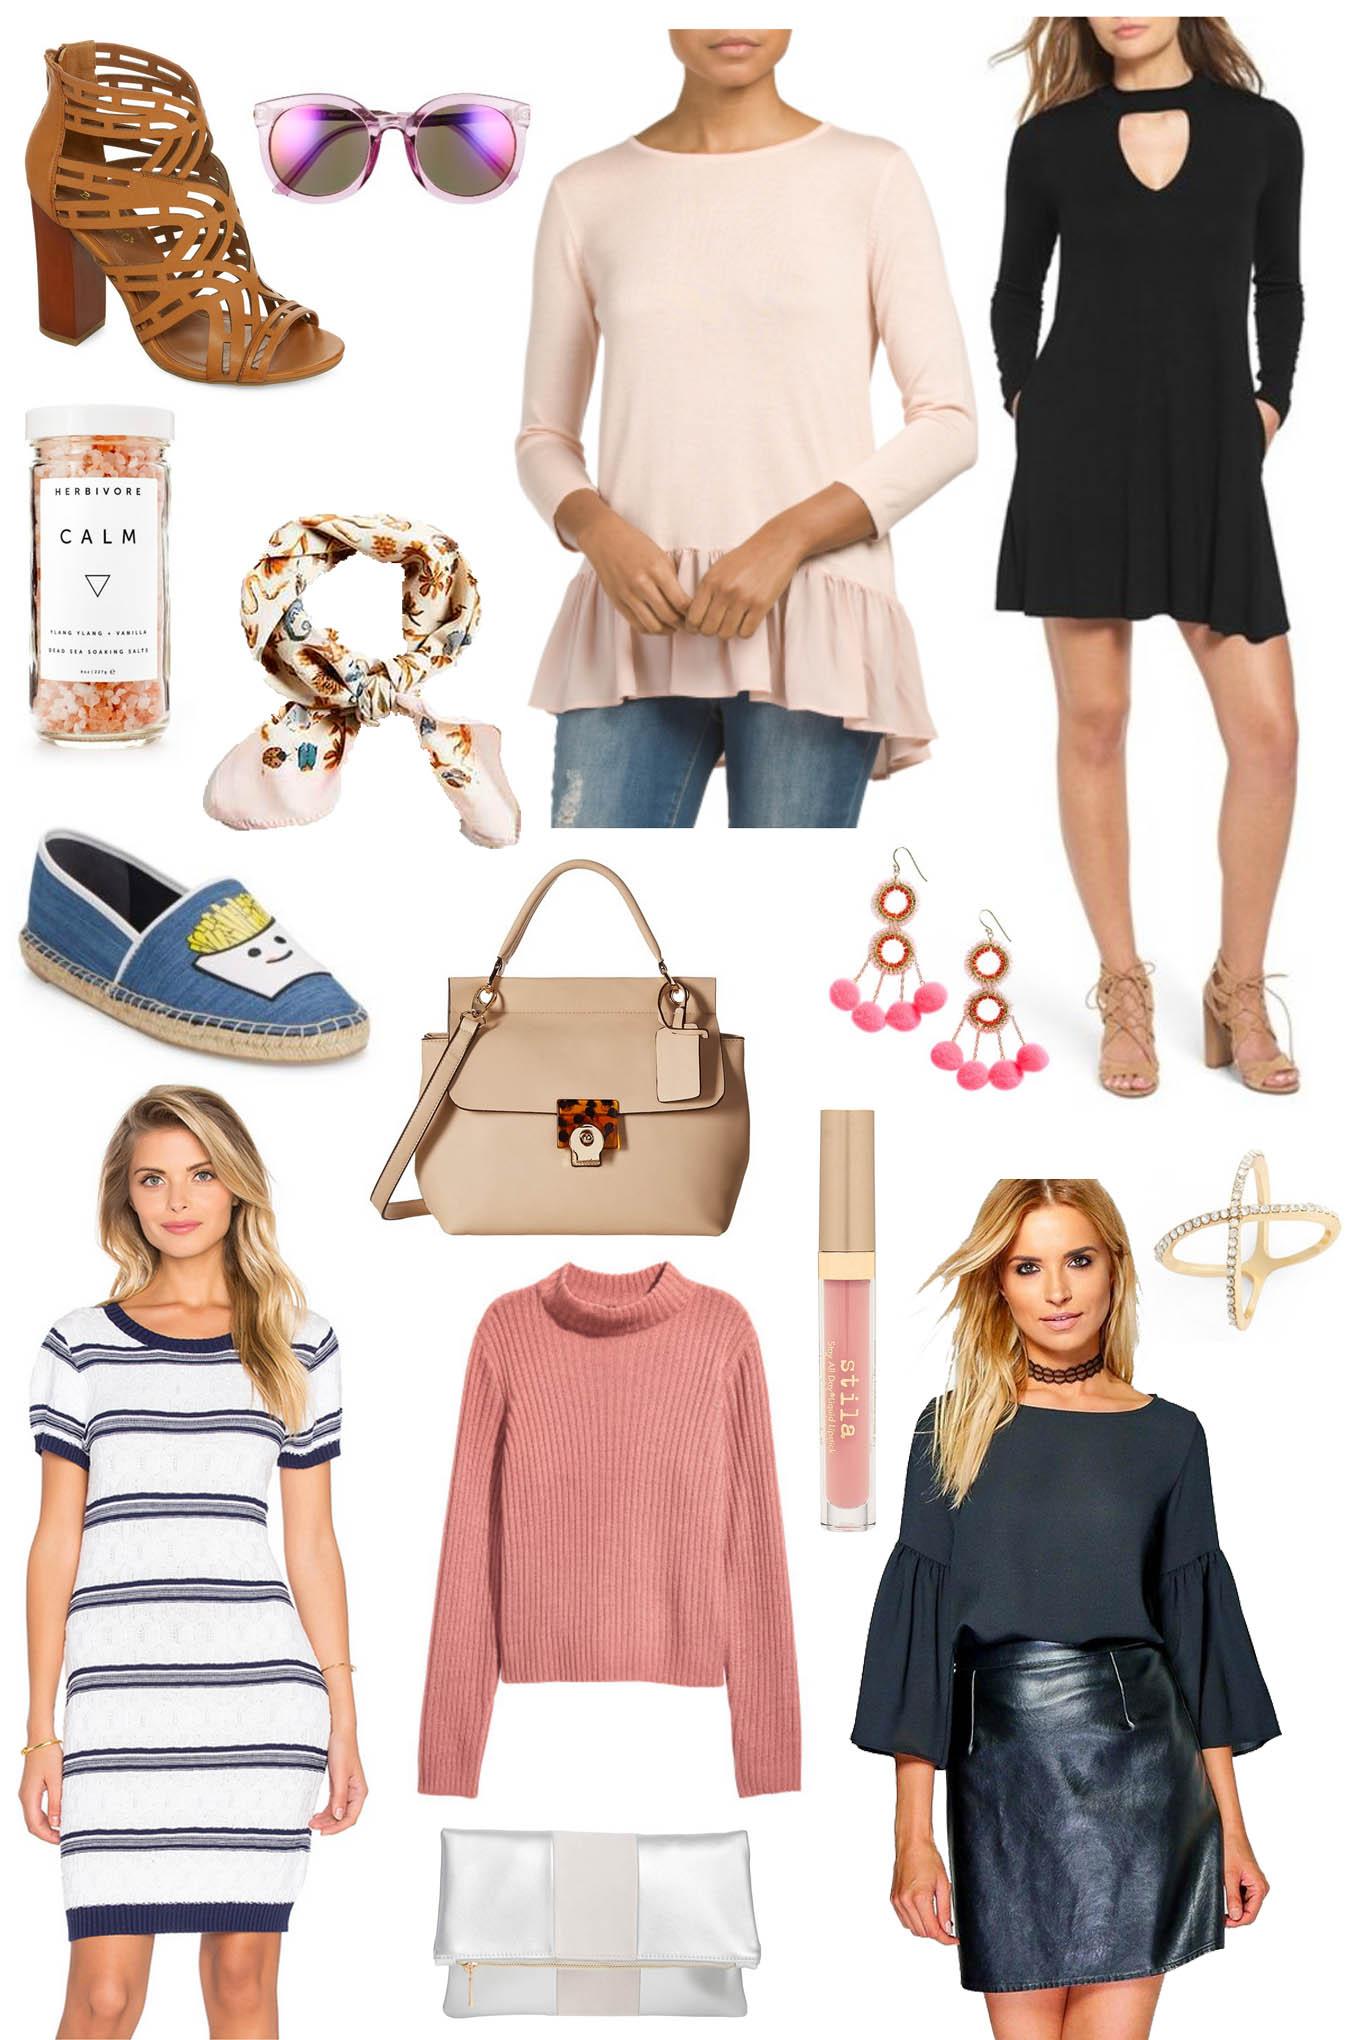 Lifestyle Blogger Roxanne Birnbaum of Glass of Glam's Elegant and under $30